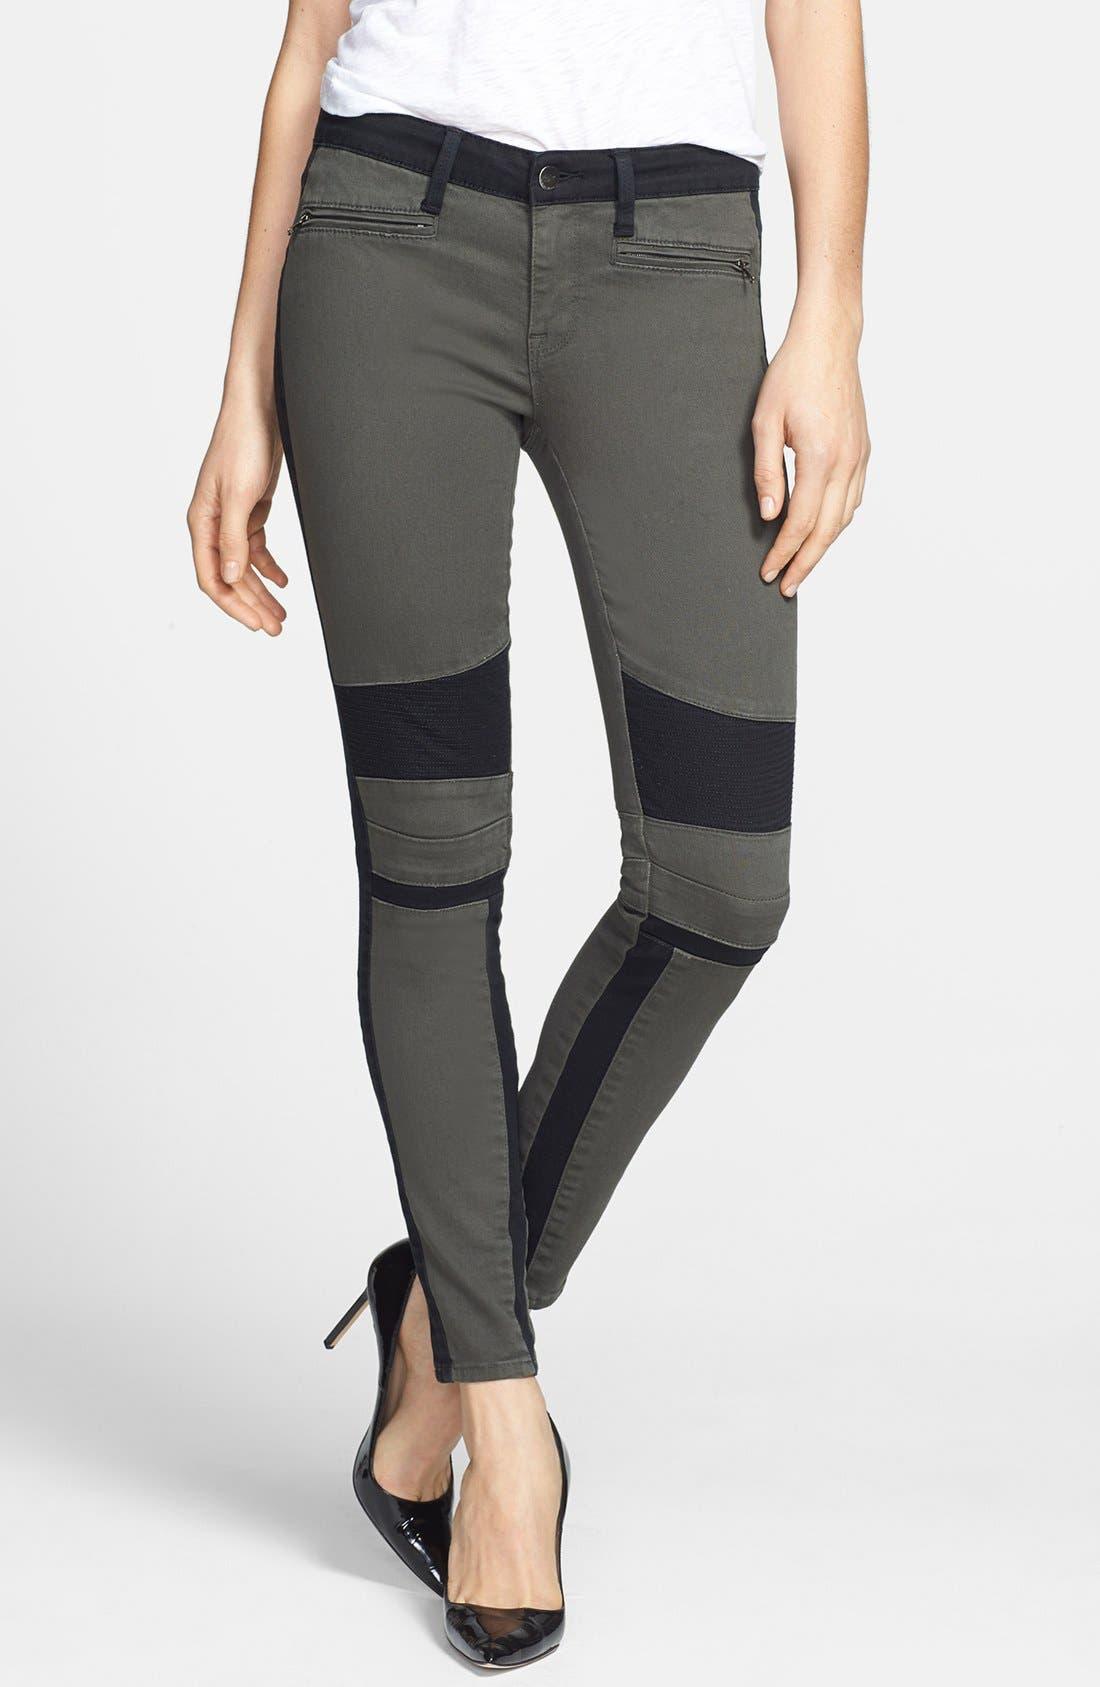 Alternate Image 1 Selected - Genetic 'Sadie' Two-Tone Moto Skinny Jeans (Chrome)